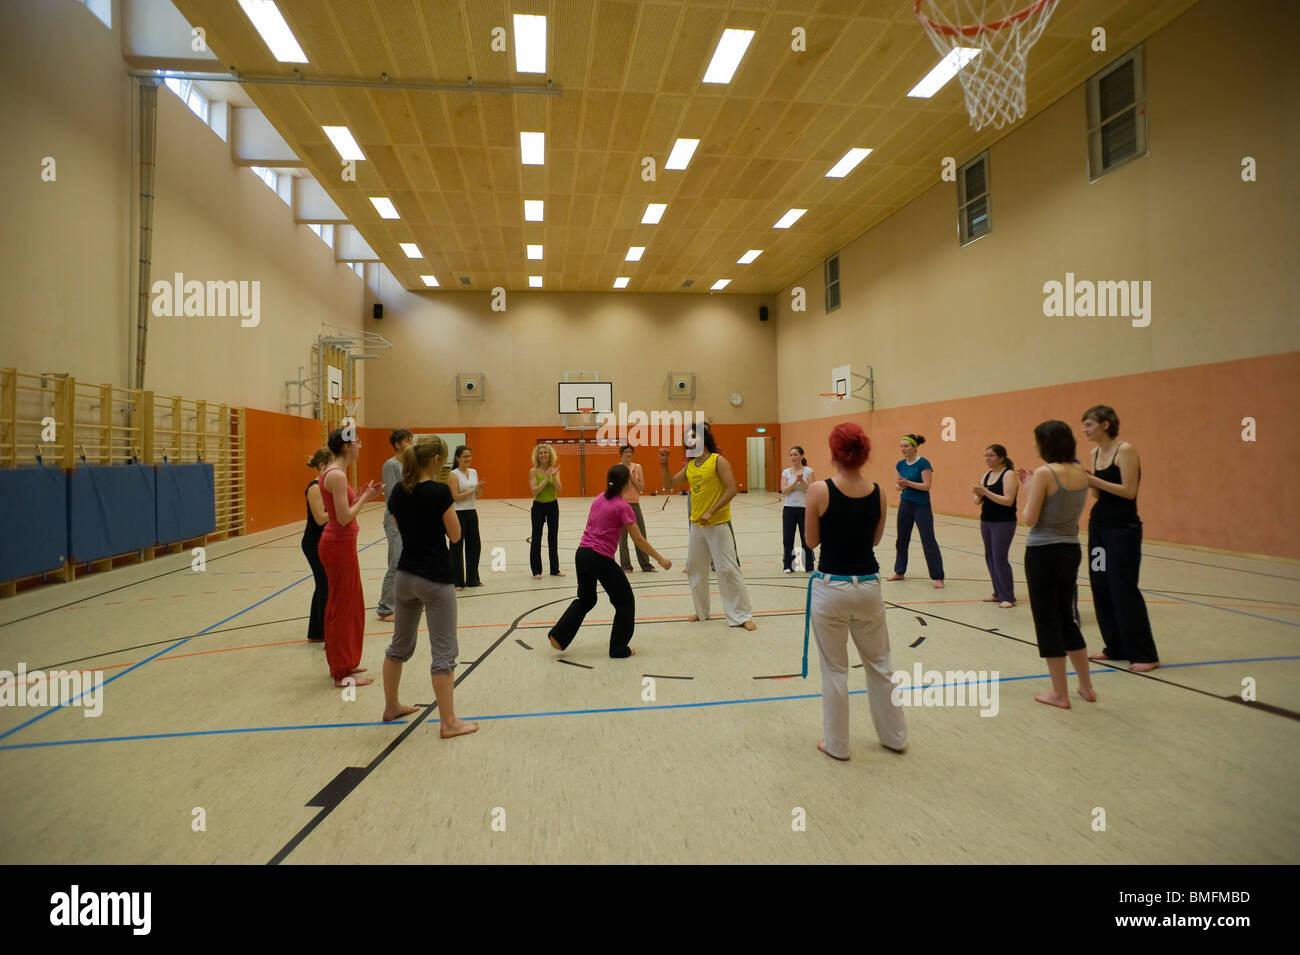 Capoeira Immagini Stock